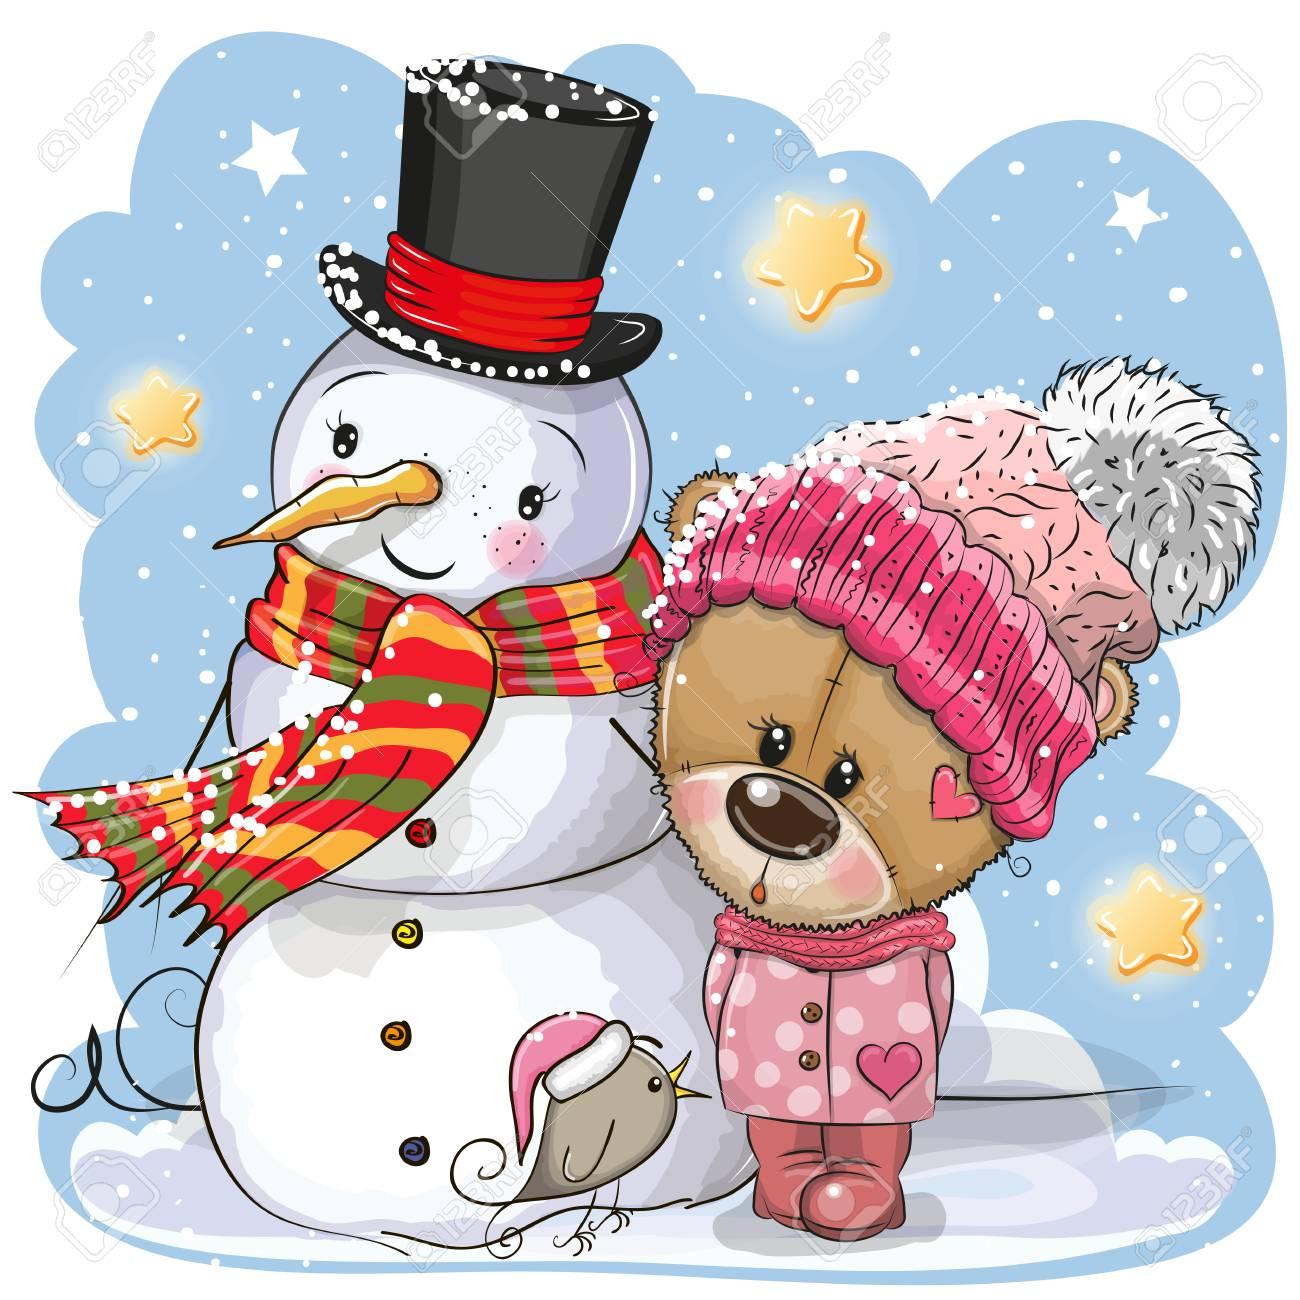 Snowman and Cute Cartoon Teddy Bear girl in a hat - 127054501